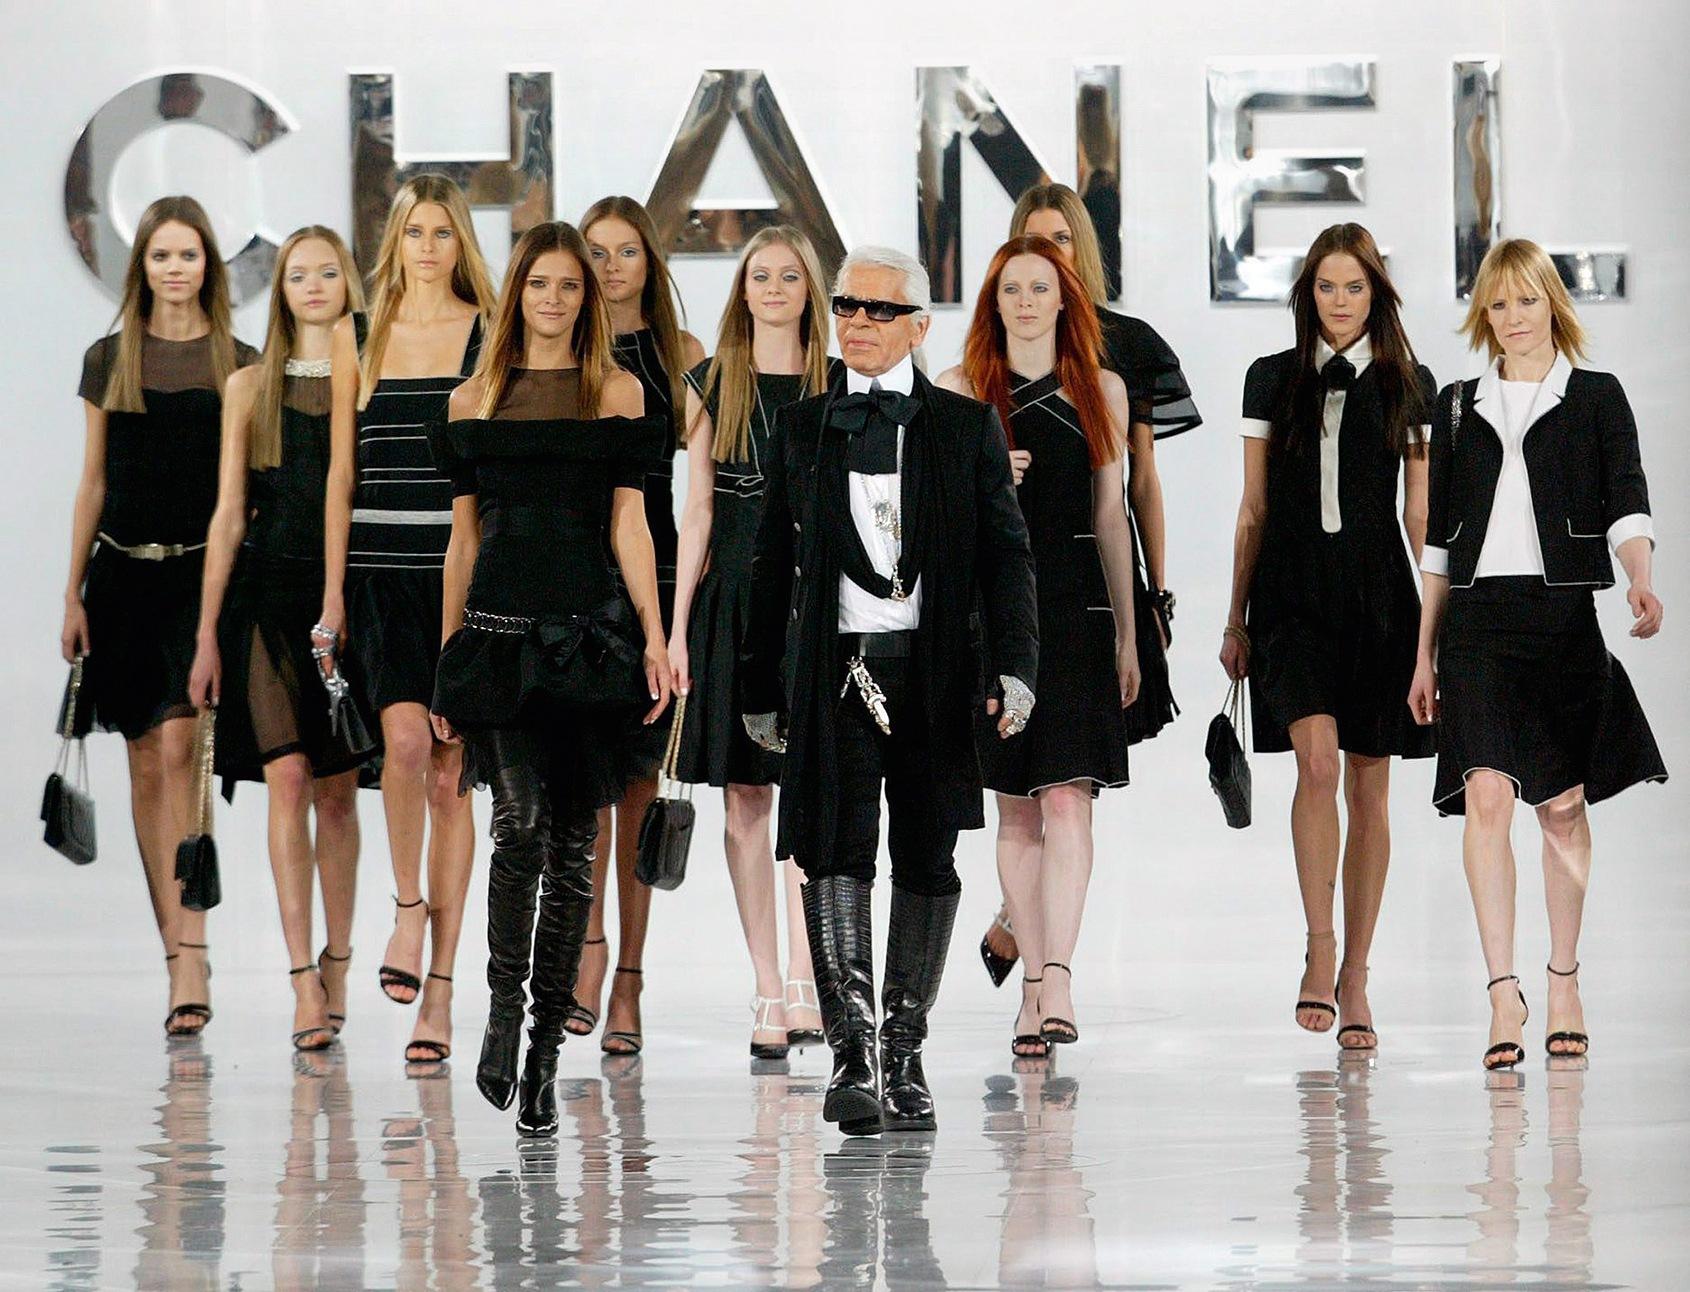 294 Lagerfeld - France - Ready-to-Wear Autumn/Winter 2005-2006 - Designer Karl Lagerfeld